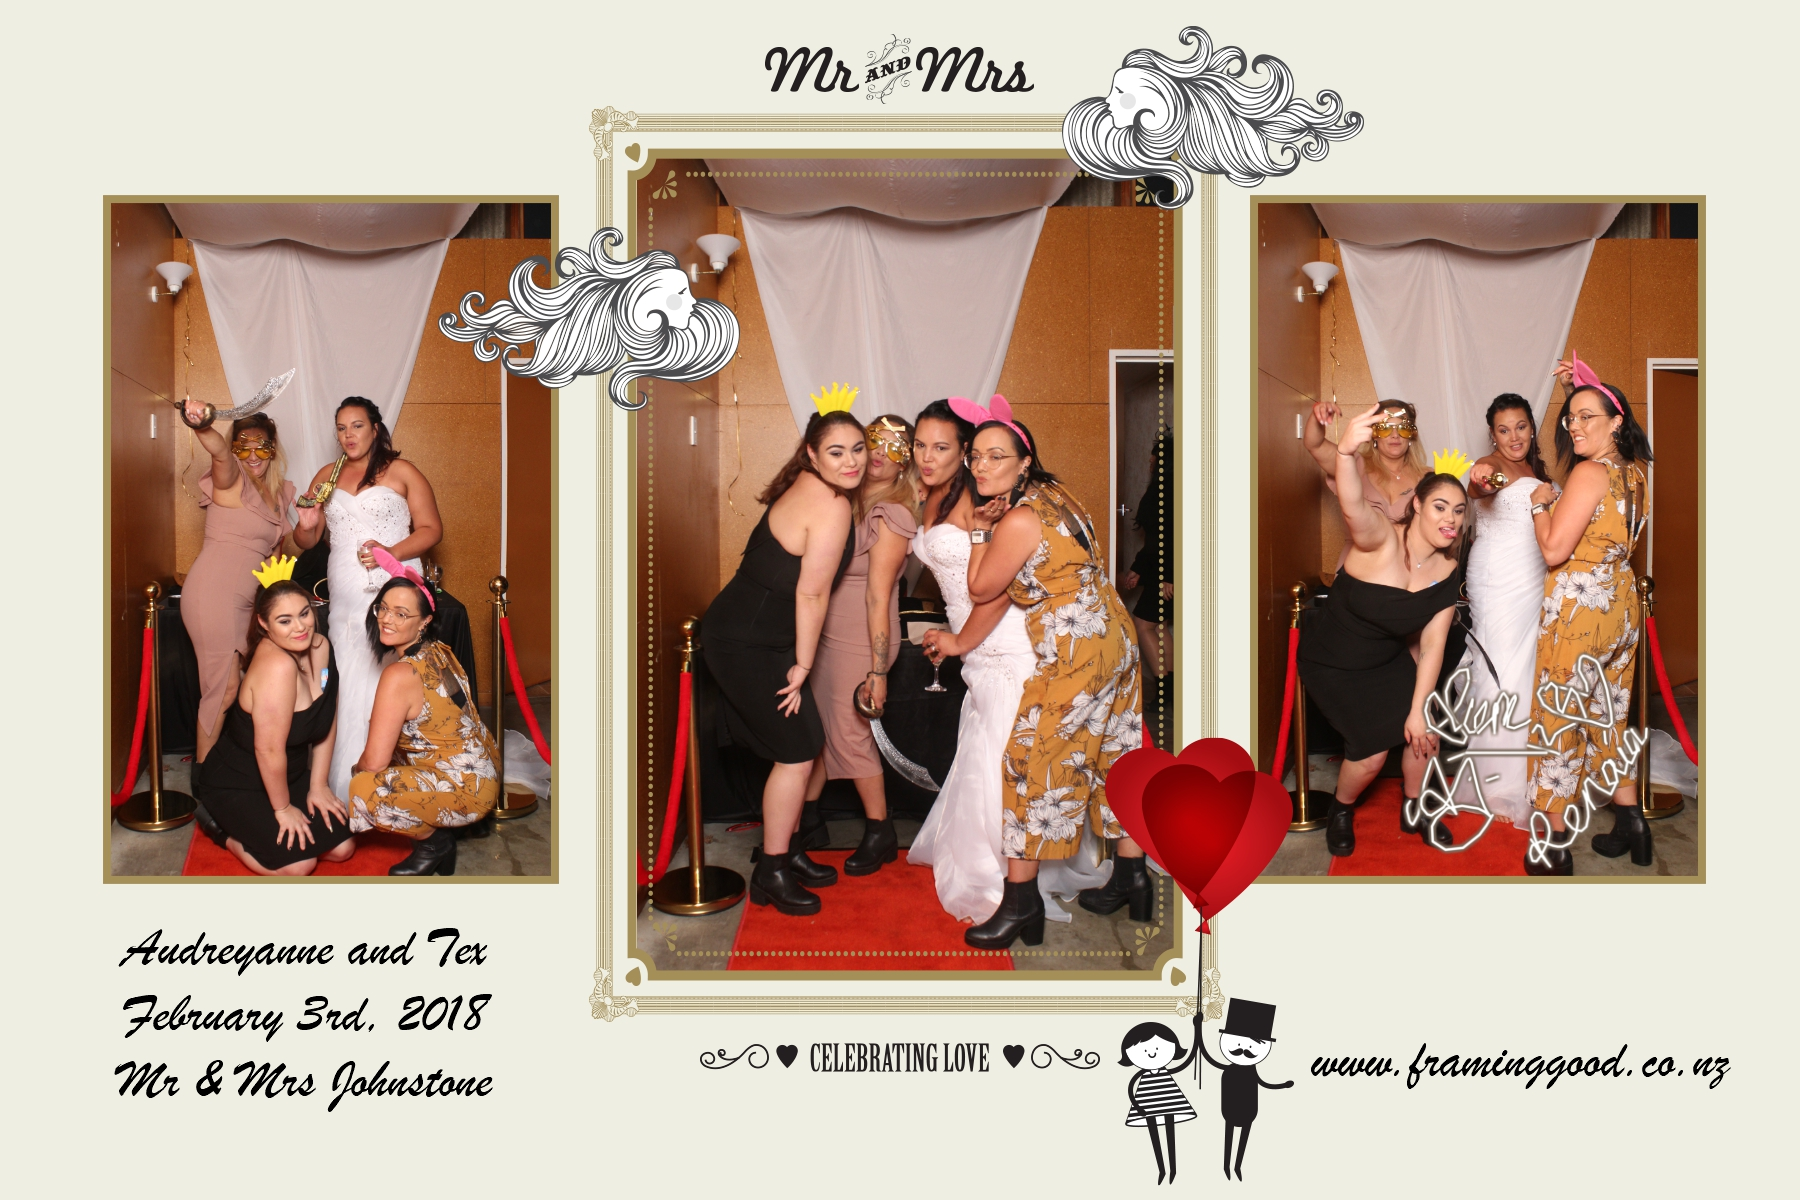 Framing Good Photo Booth_Wedding.jpg